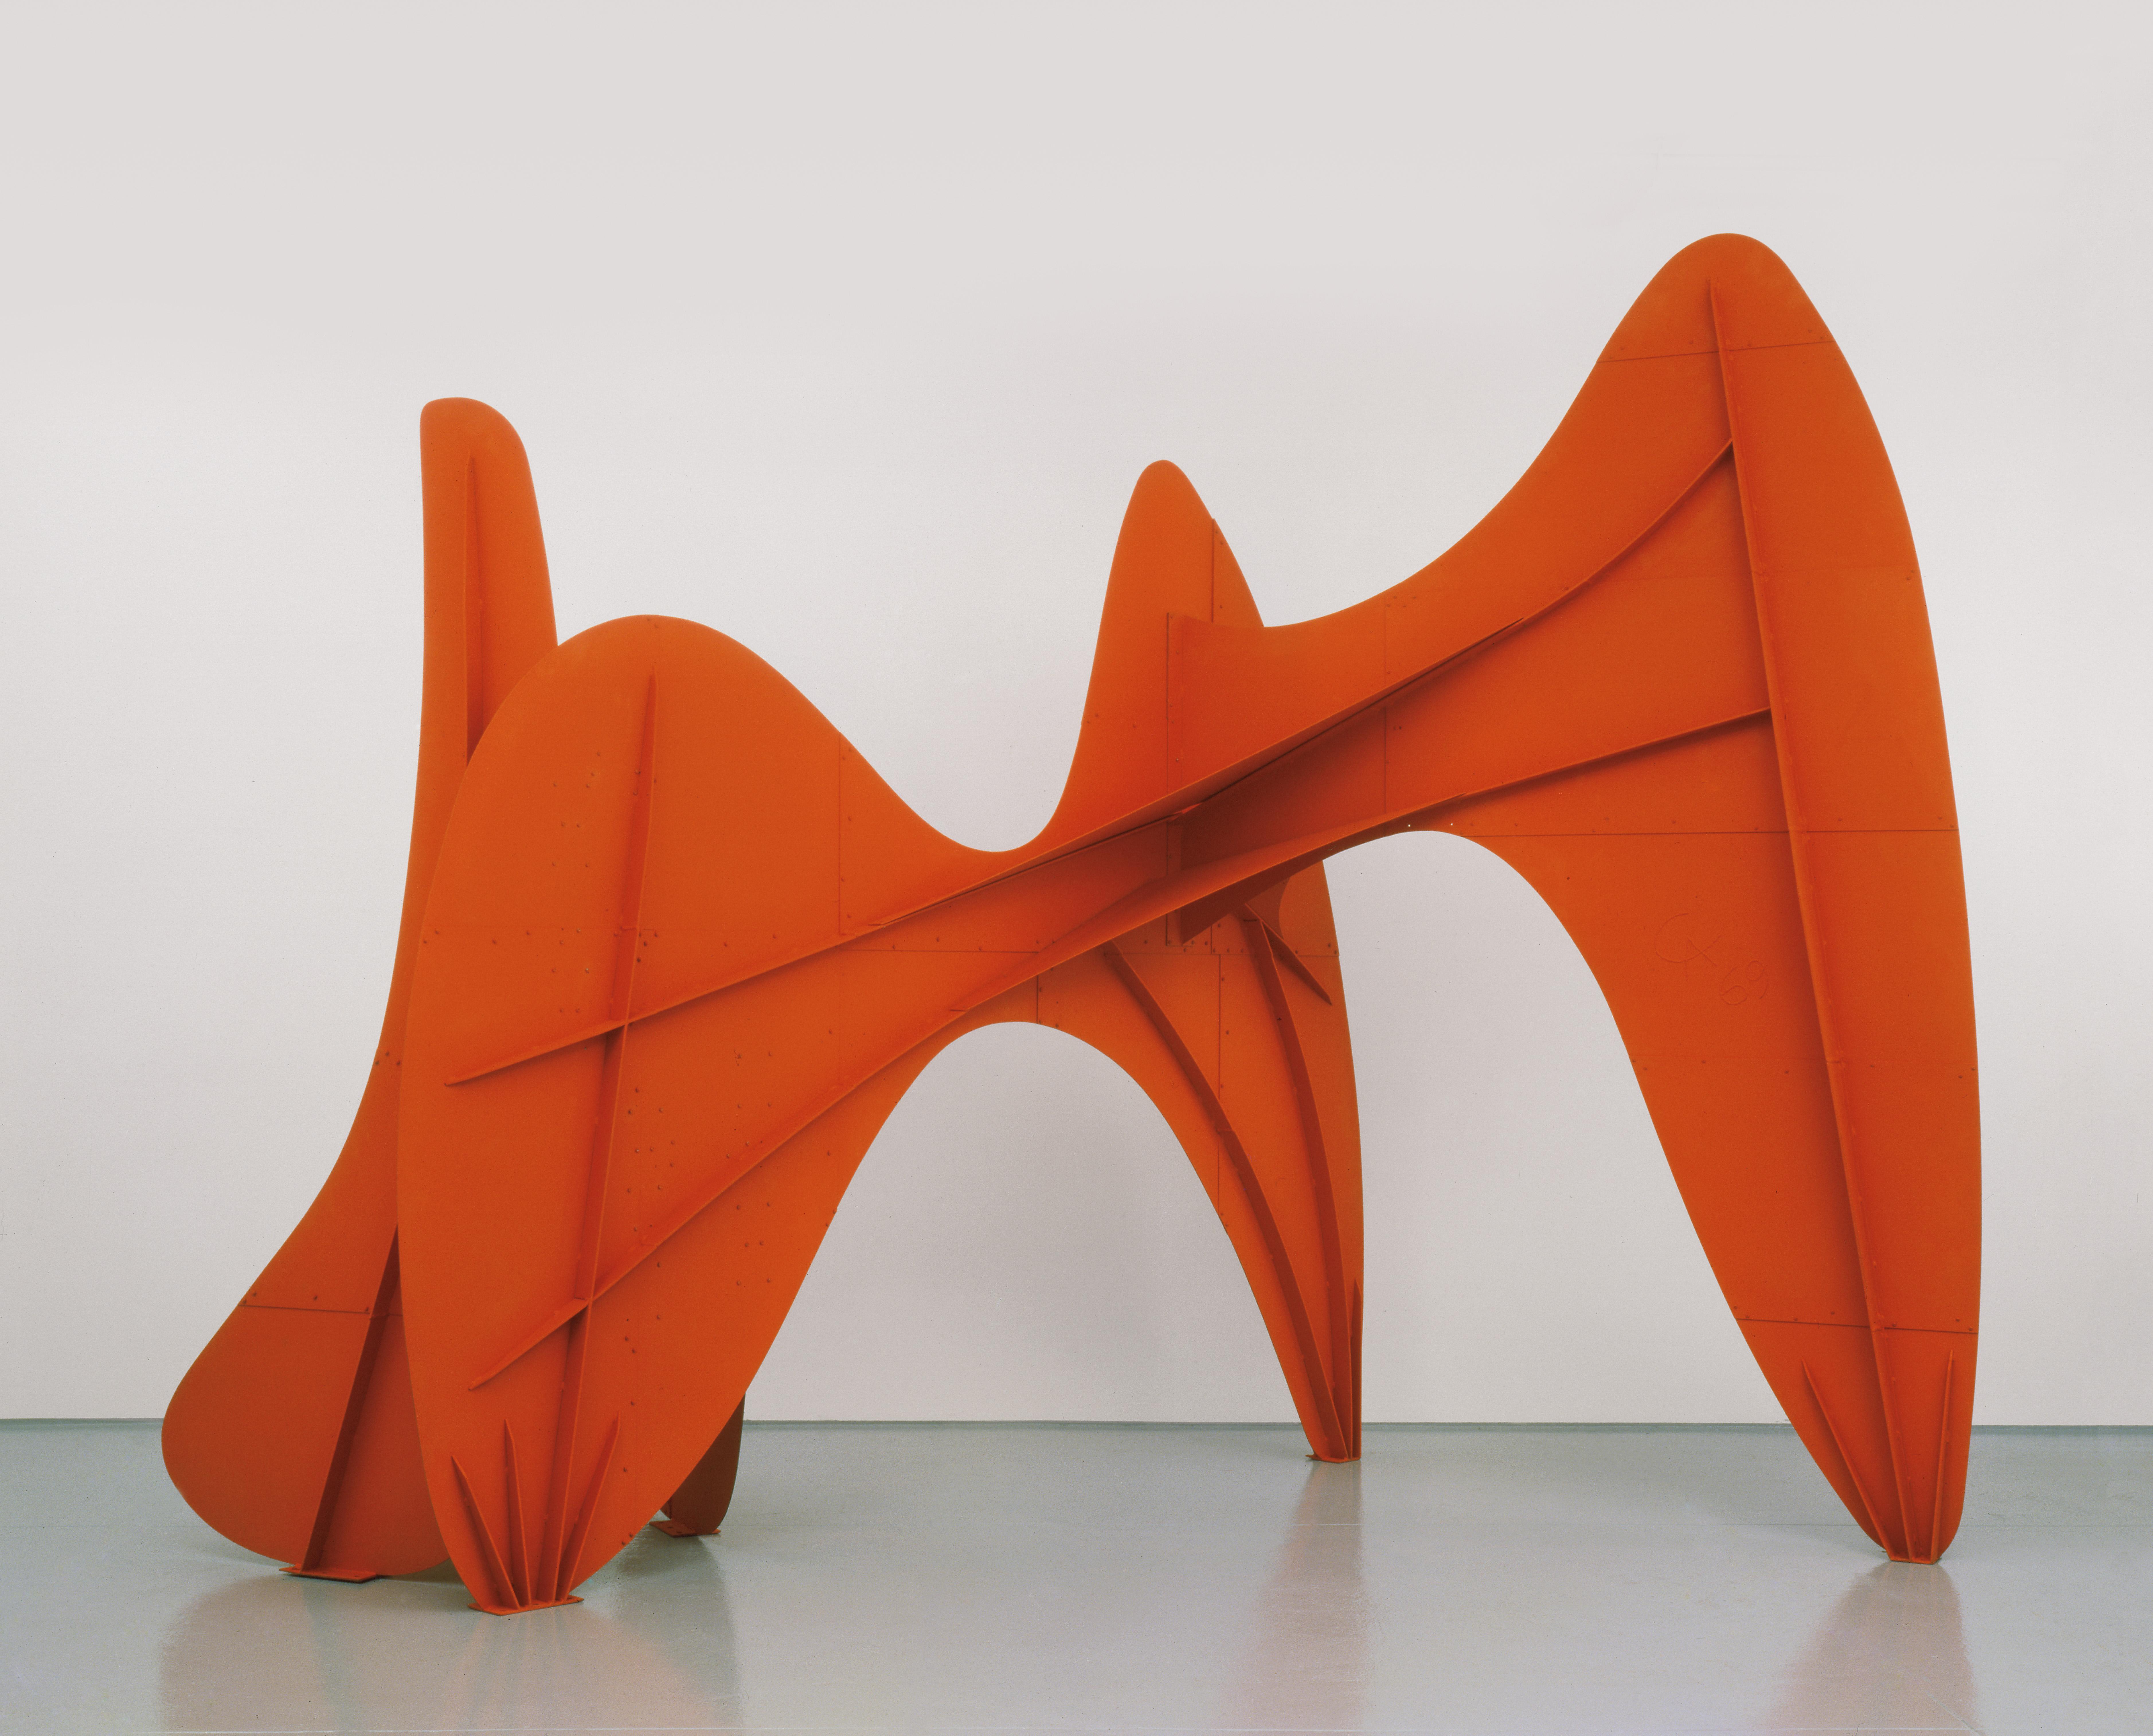 "La Grande vitesse (1:5 intermediate maquette). 1969. Sheet metal, bolts, and paint,  102"" x 135"" x 93"" (259.1 x 342.9 x 236.2 cm)."